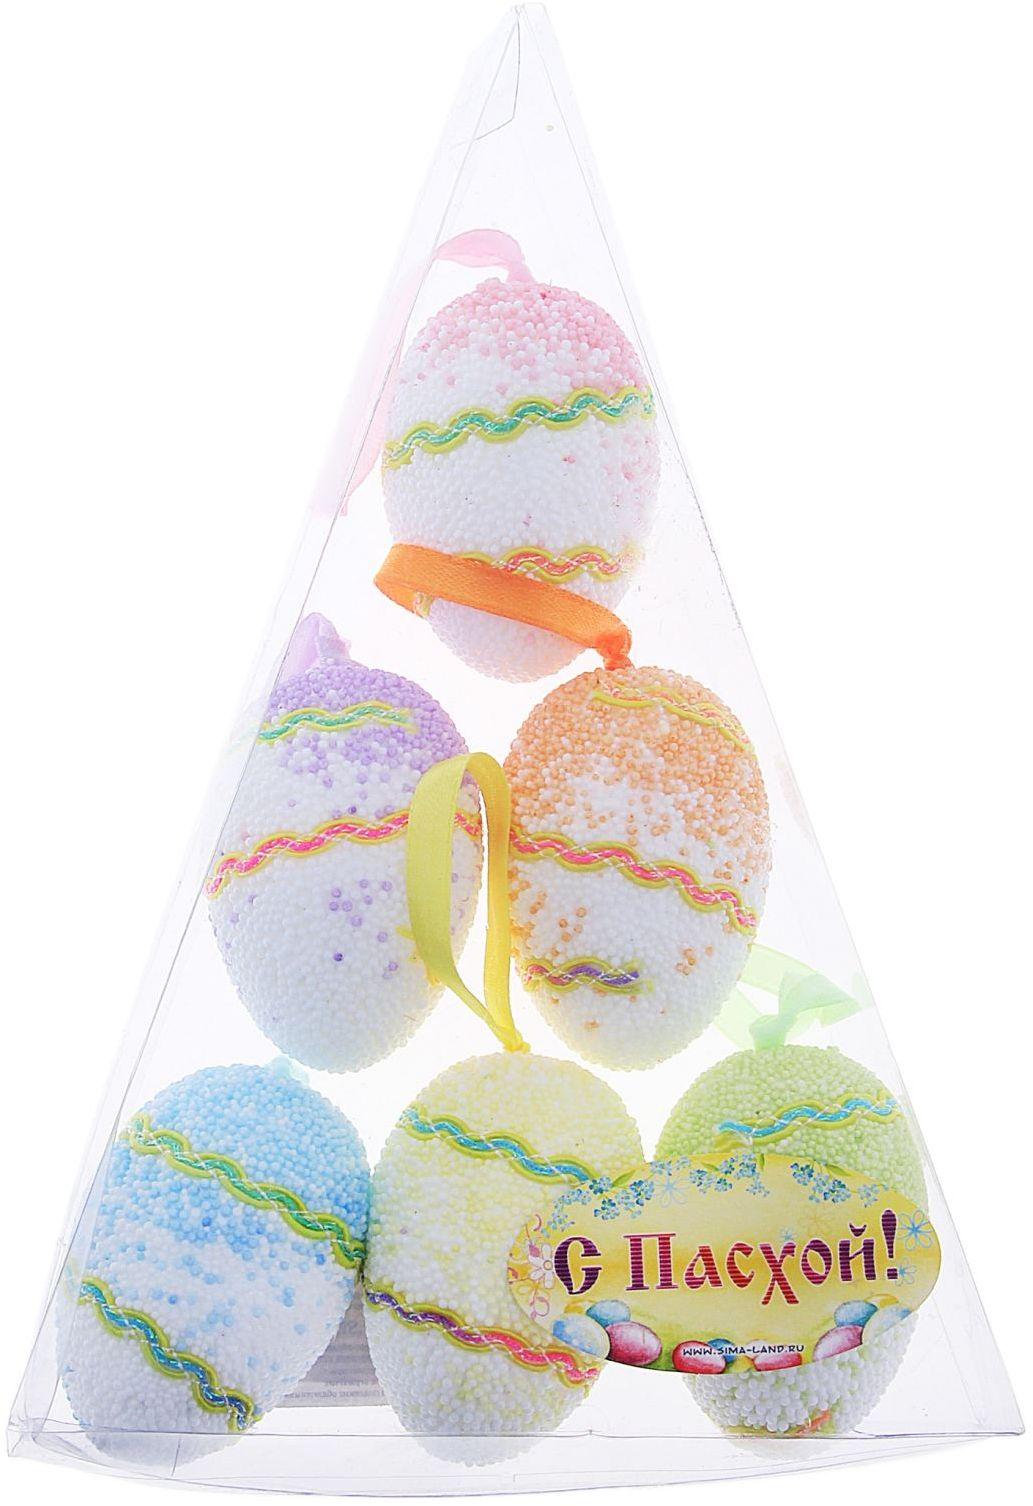 Сувенир пасхальный Sima-land Яйцо. Ассорти, 4 х 4 х 6 см, 6 шт